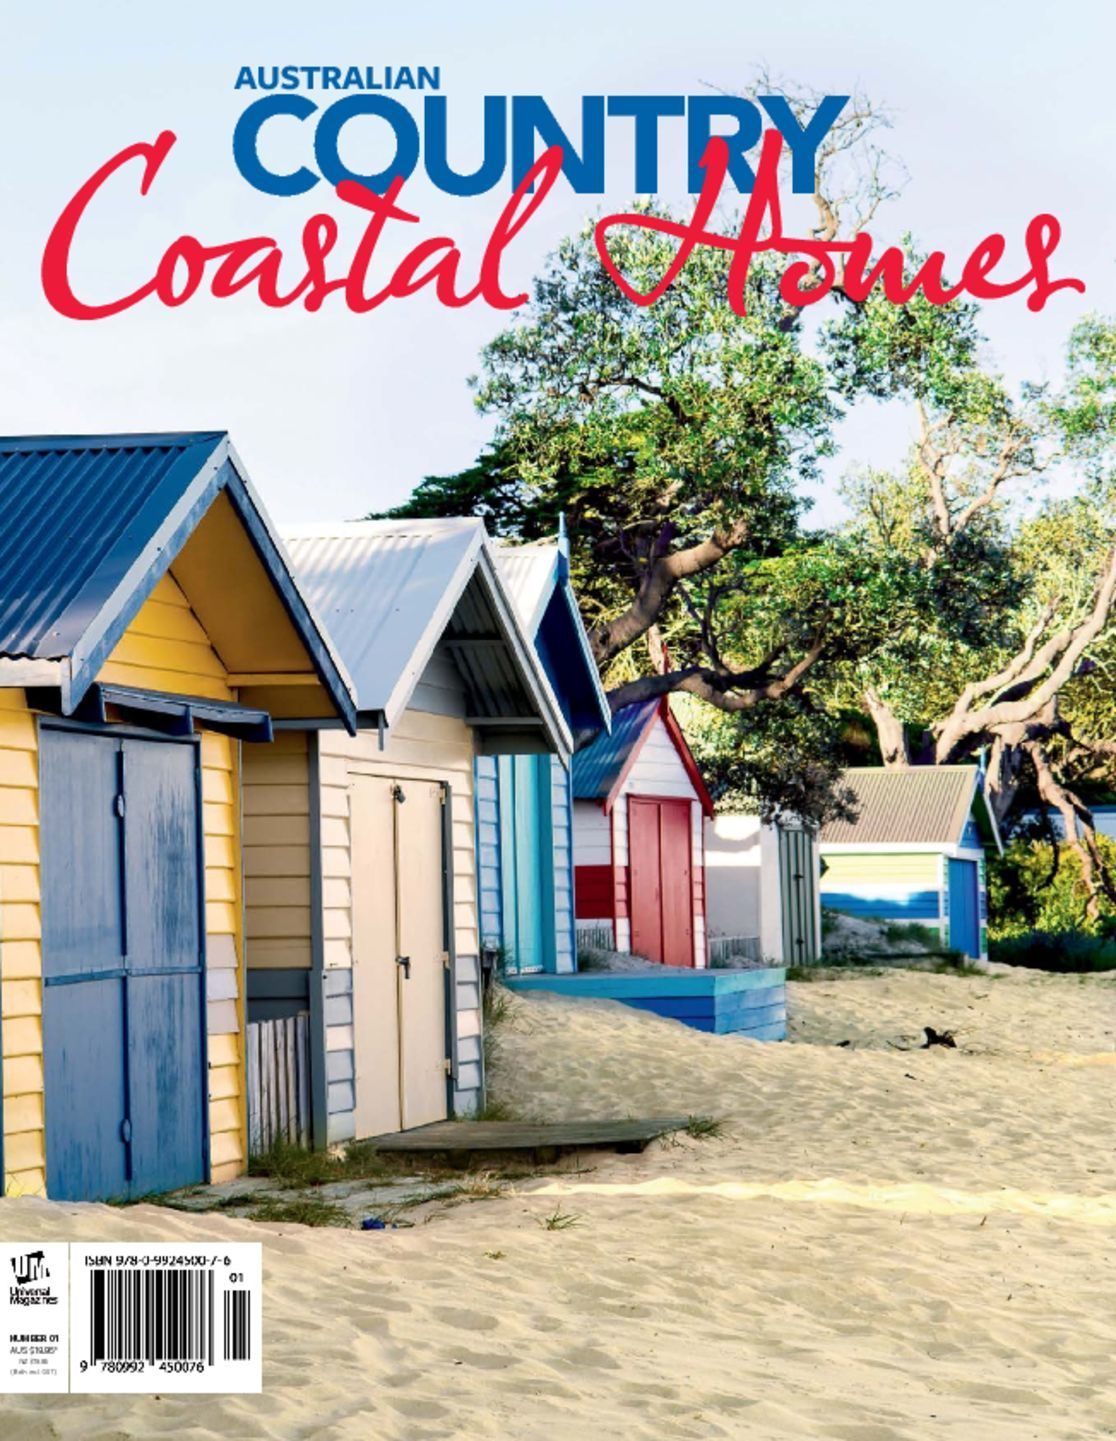 Australian Country Coastal Homes Digital